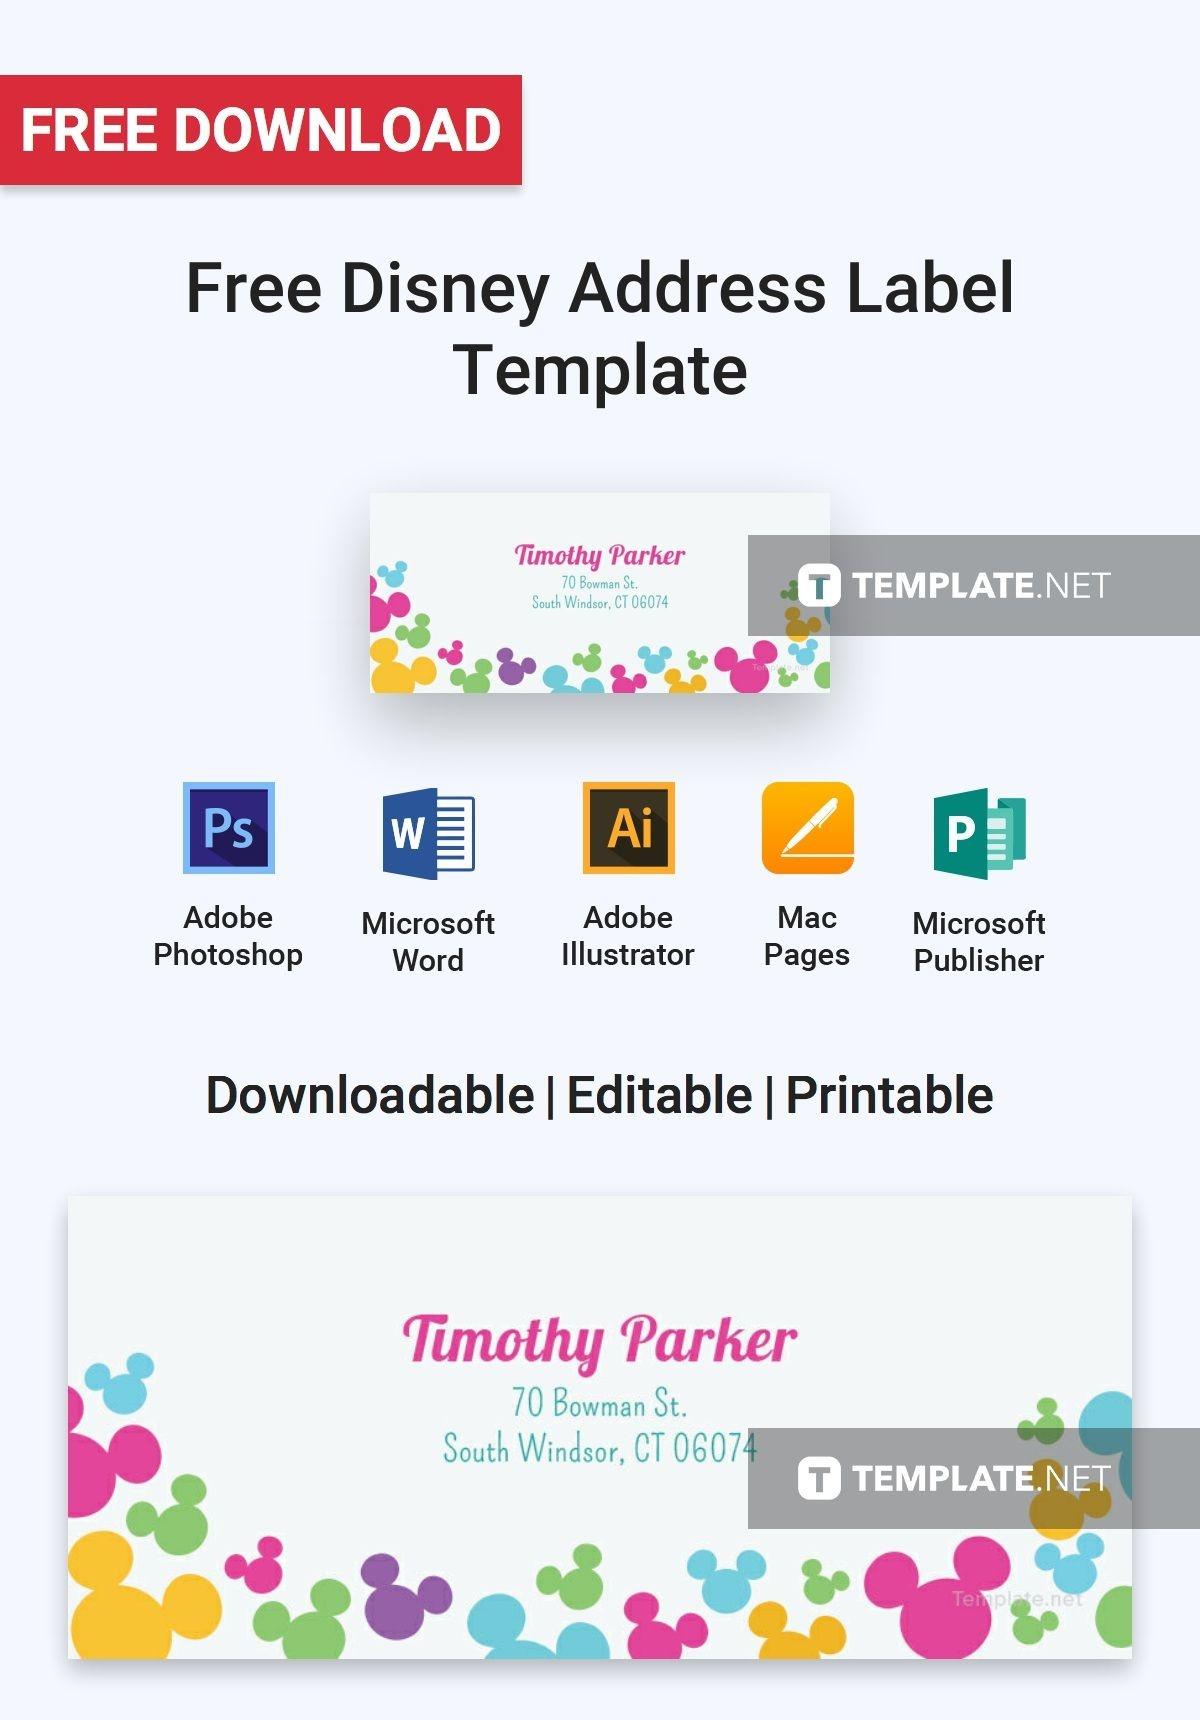 Free Disney Address Label | Label Templates & Designs 2019 | Label - Free Printable Disney Address Labels